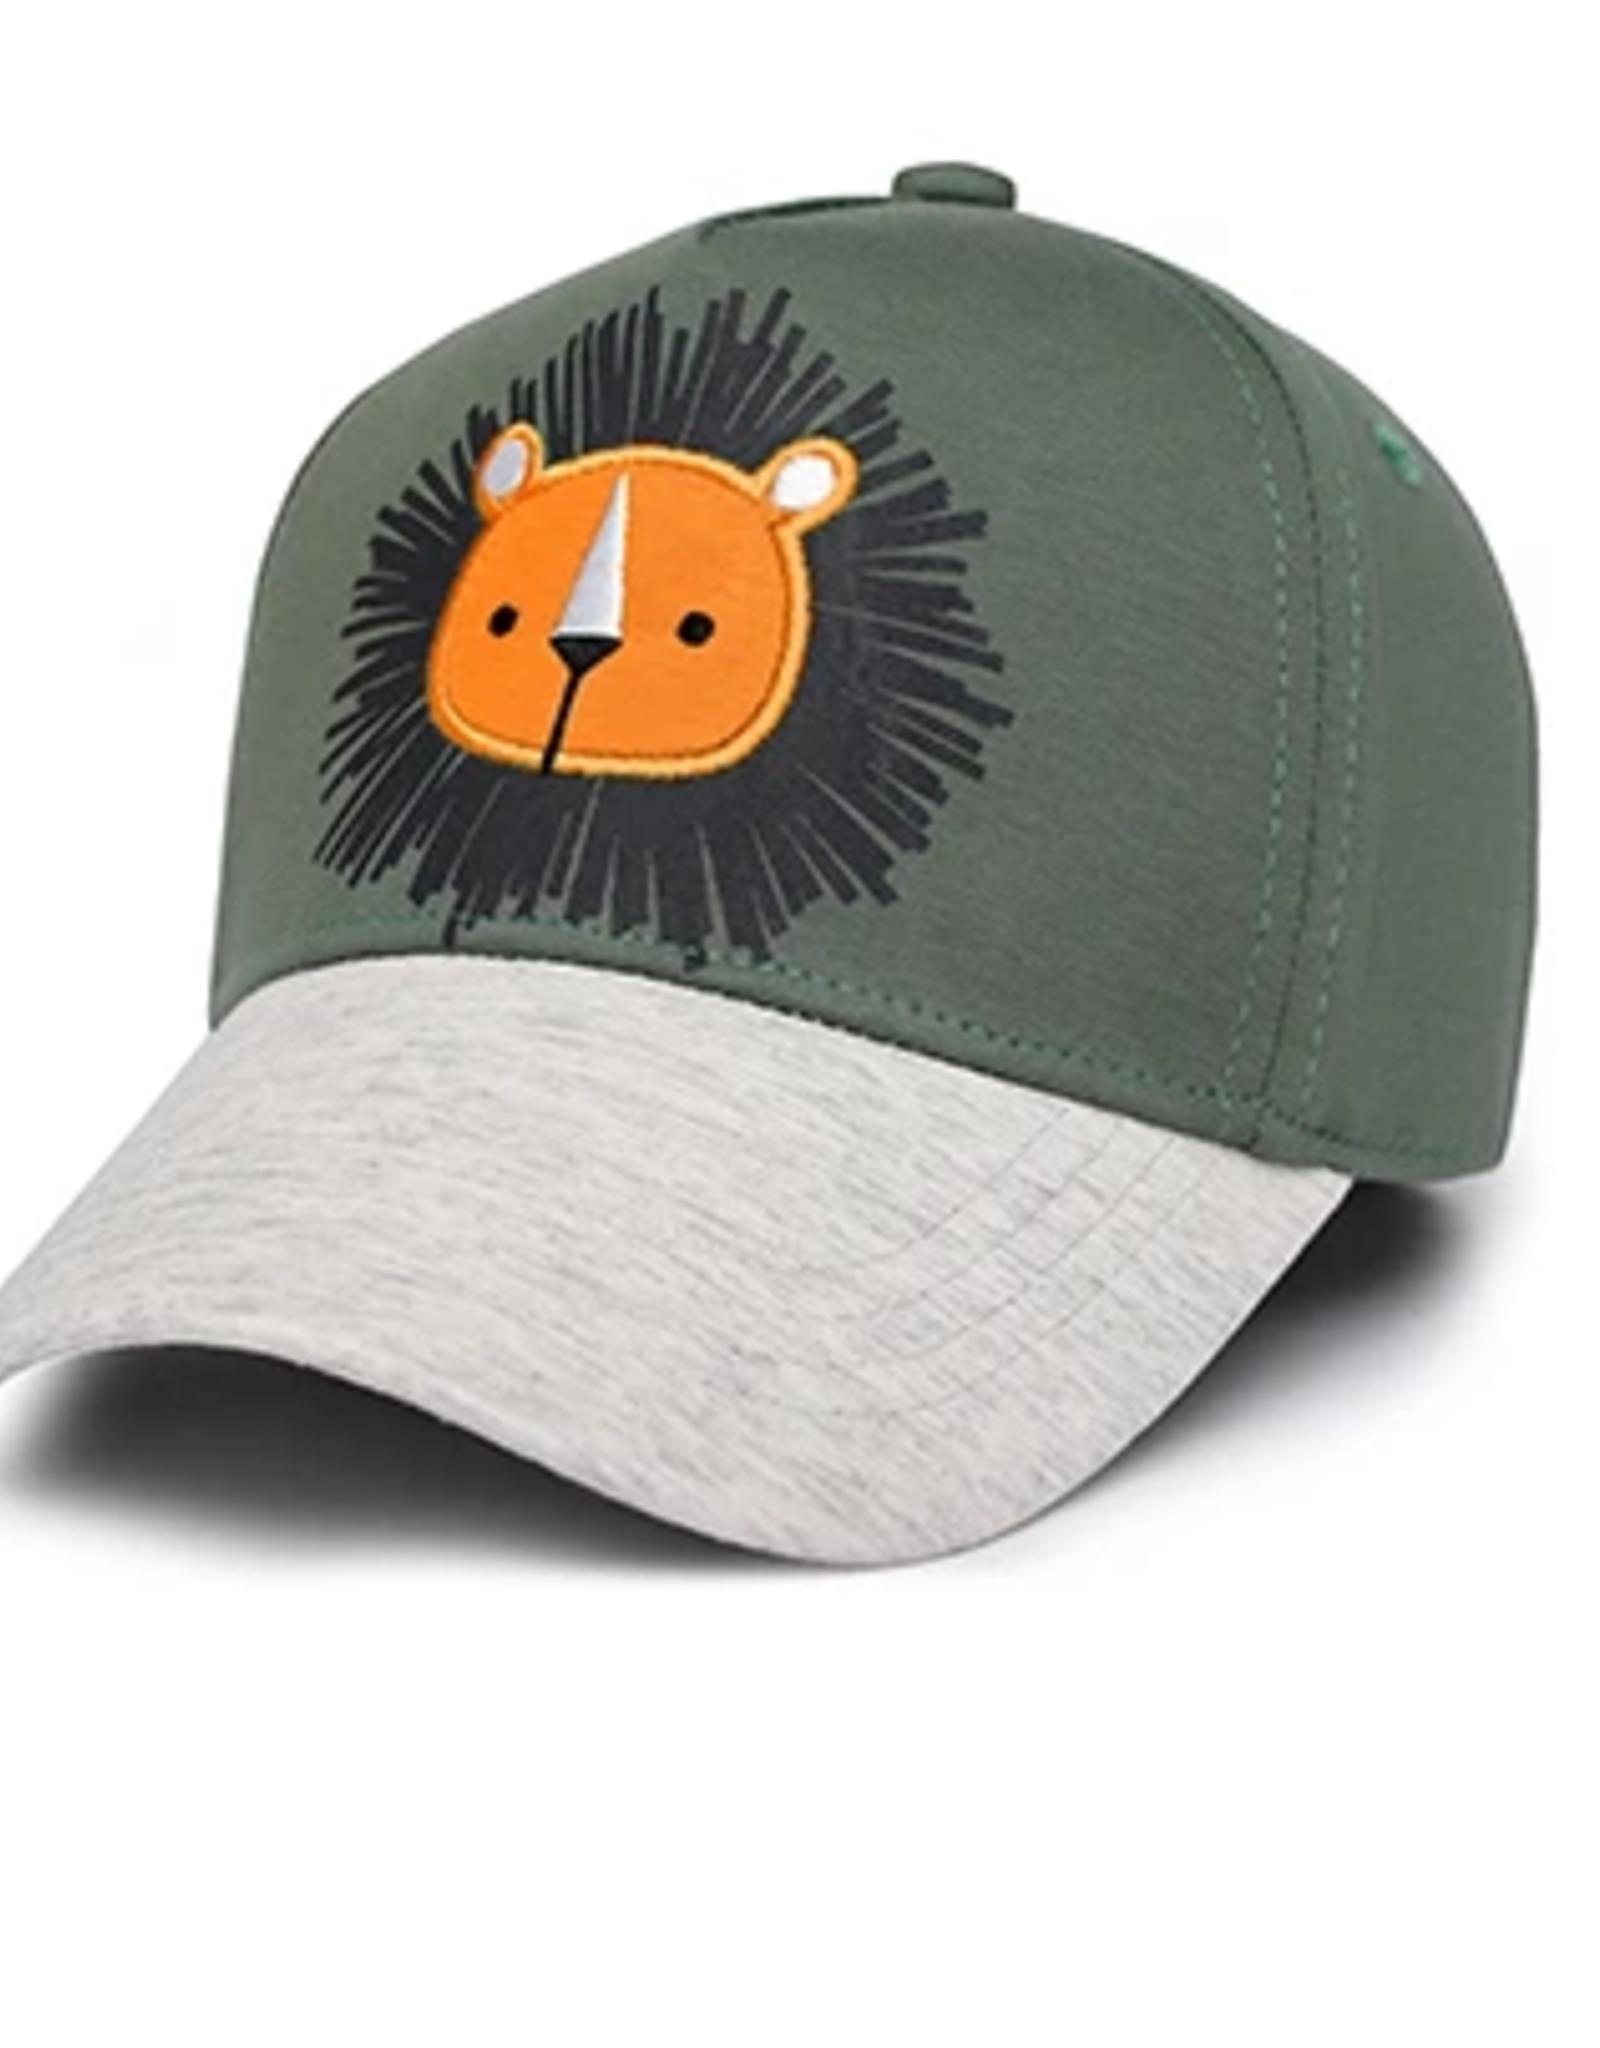 Flap Jacks Flap Jacks Kids Caps - Lion